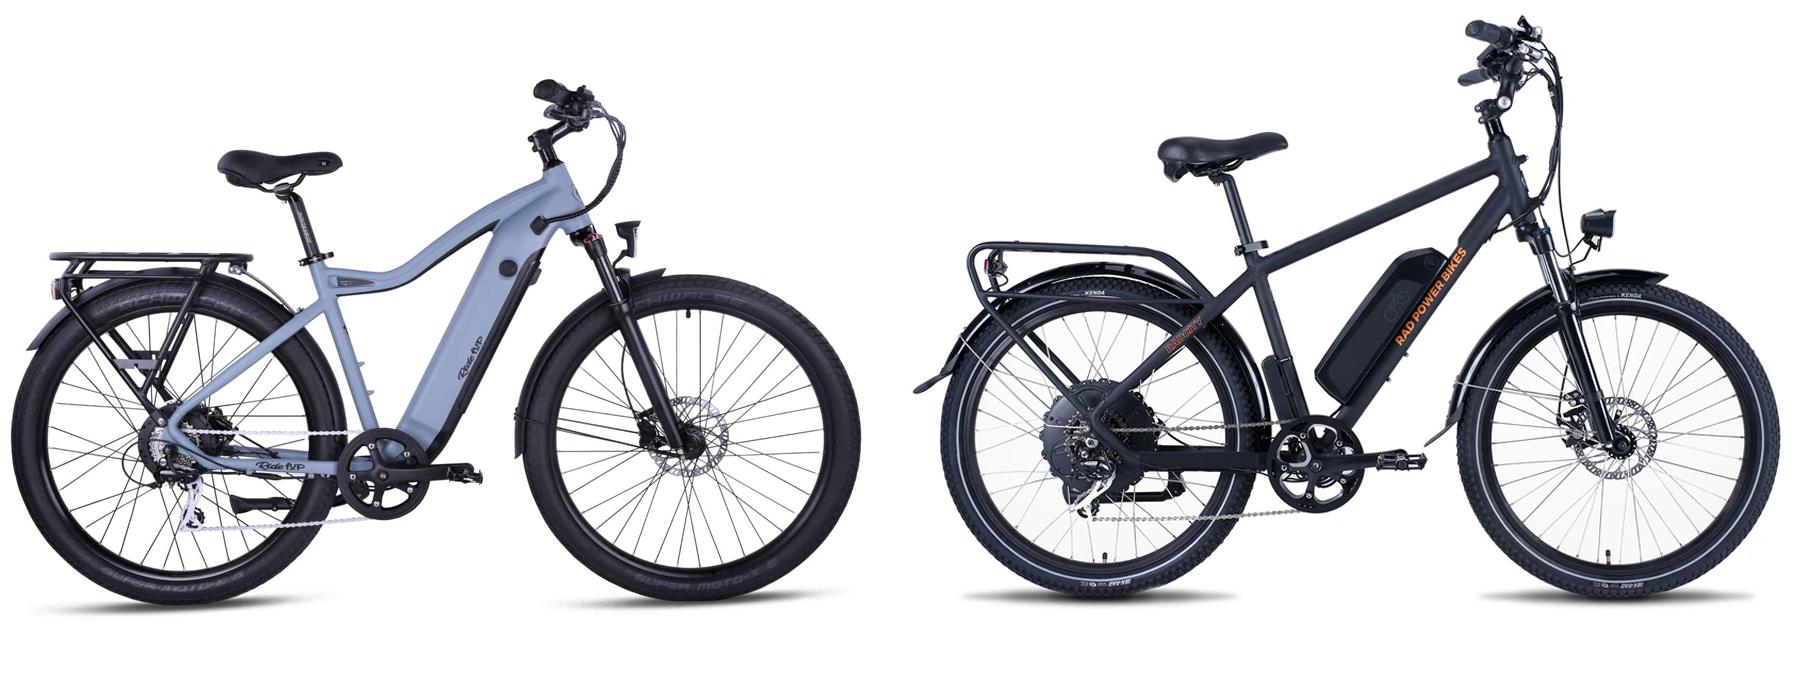 ride1up 700 series vs rad power bikes radcity4